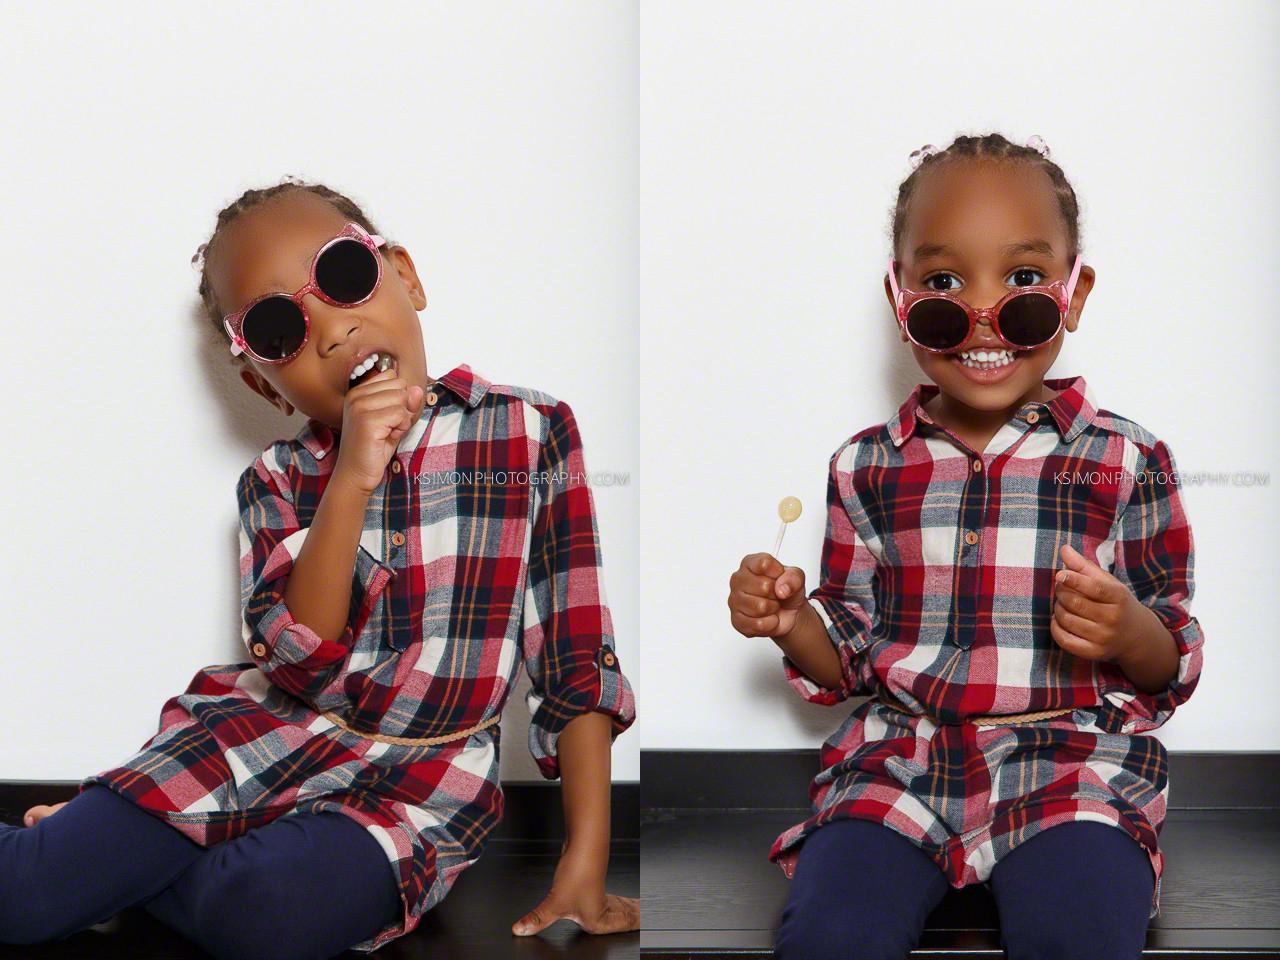 Lifestyle Family Portrait | Atlanta + Dallas Lifestyle, Fashion & Business Portrait Studio and Outdoor Photographer | ksimonphotography.com | © KSimon Photography, LLC